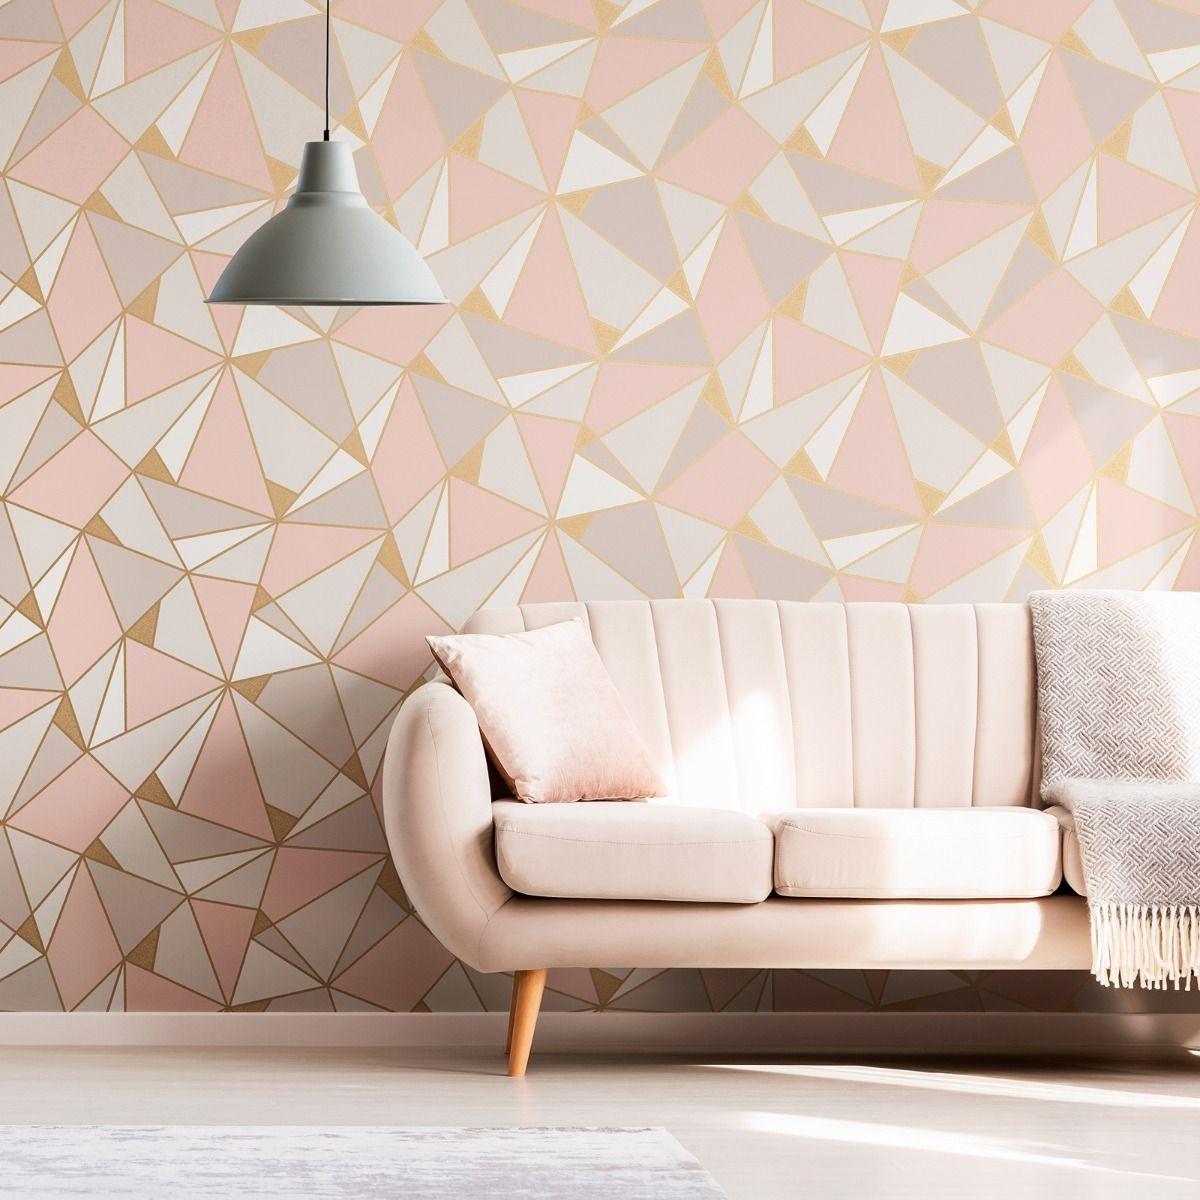 Apex Geometric Wallpaper Rose Gold Fine Decor Fd41993 Pink Wallpaper Living Room Geometric Wallpaper Rose Gold Bedroom Wall Designs